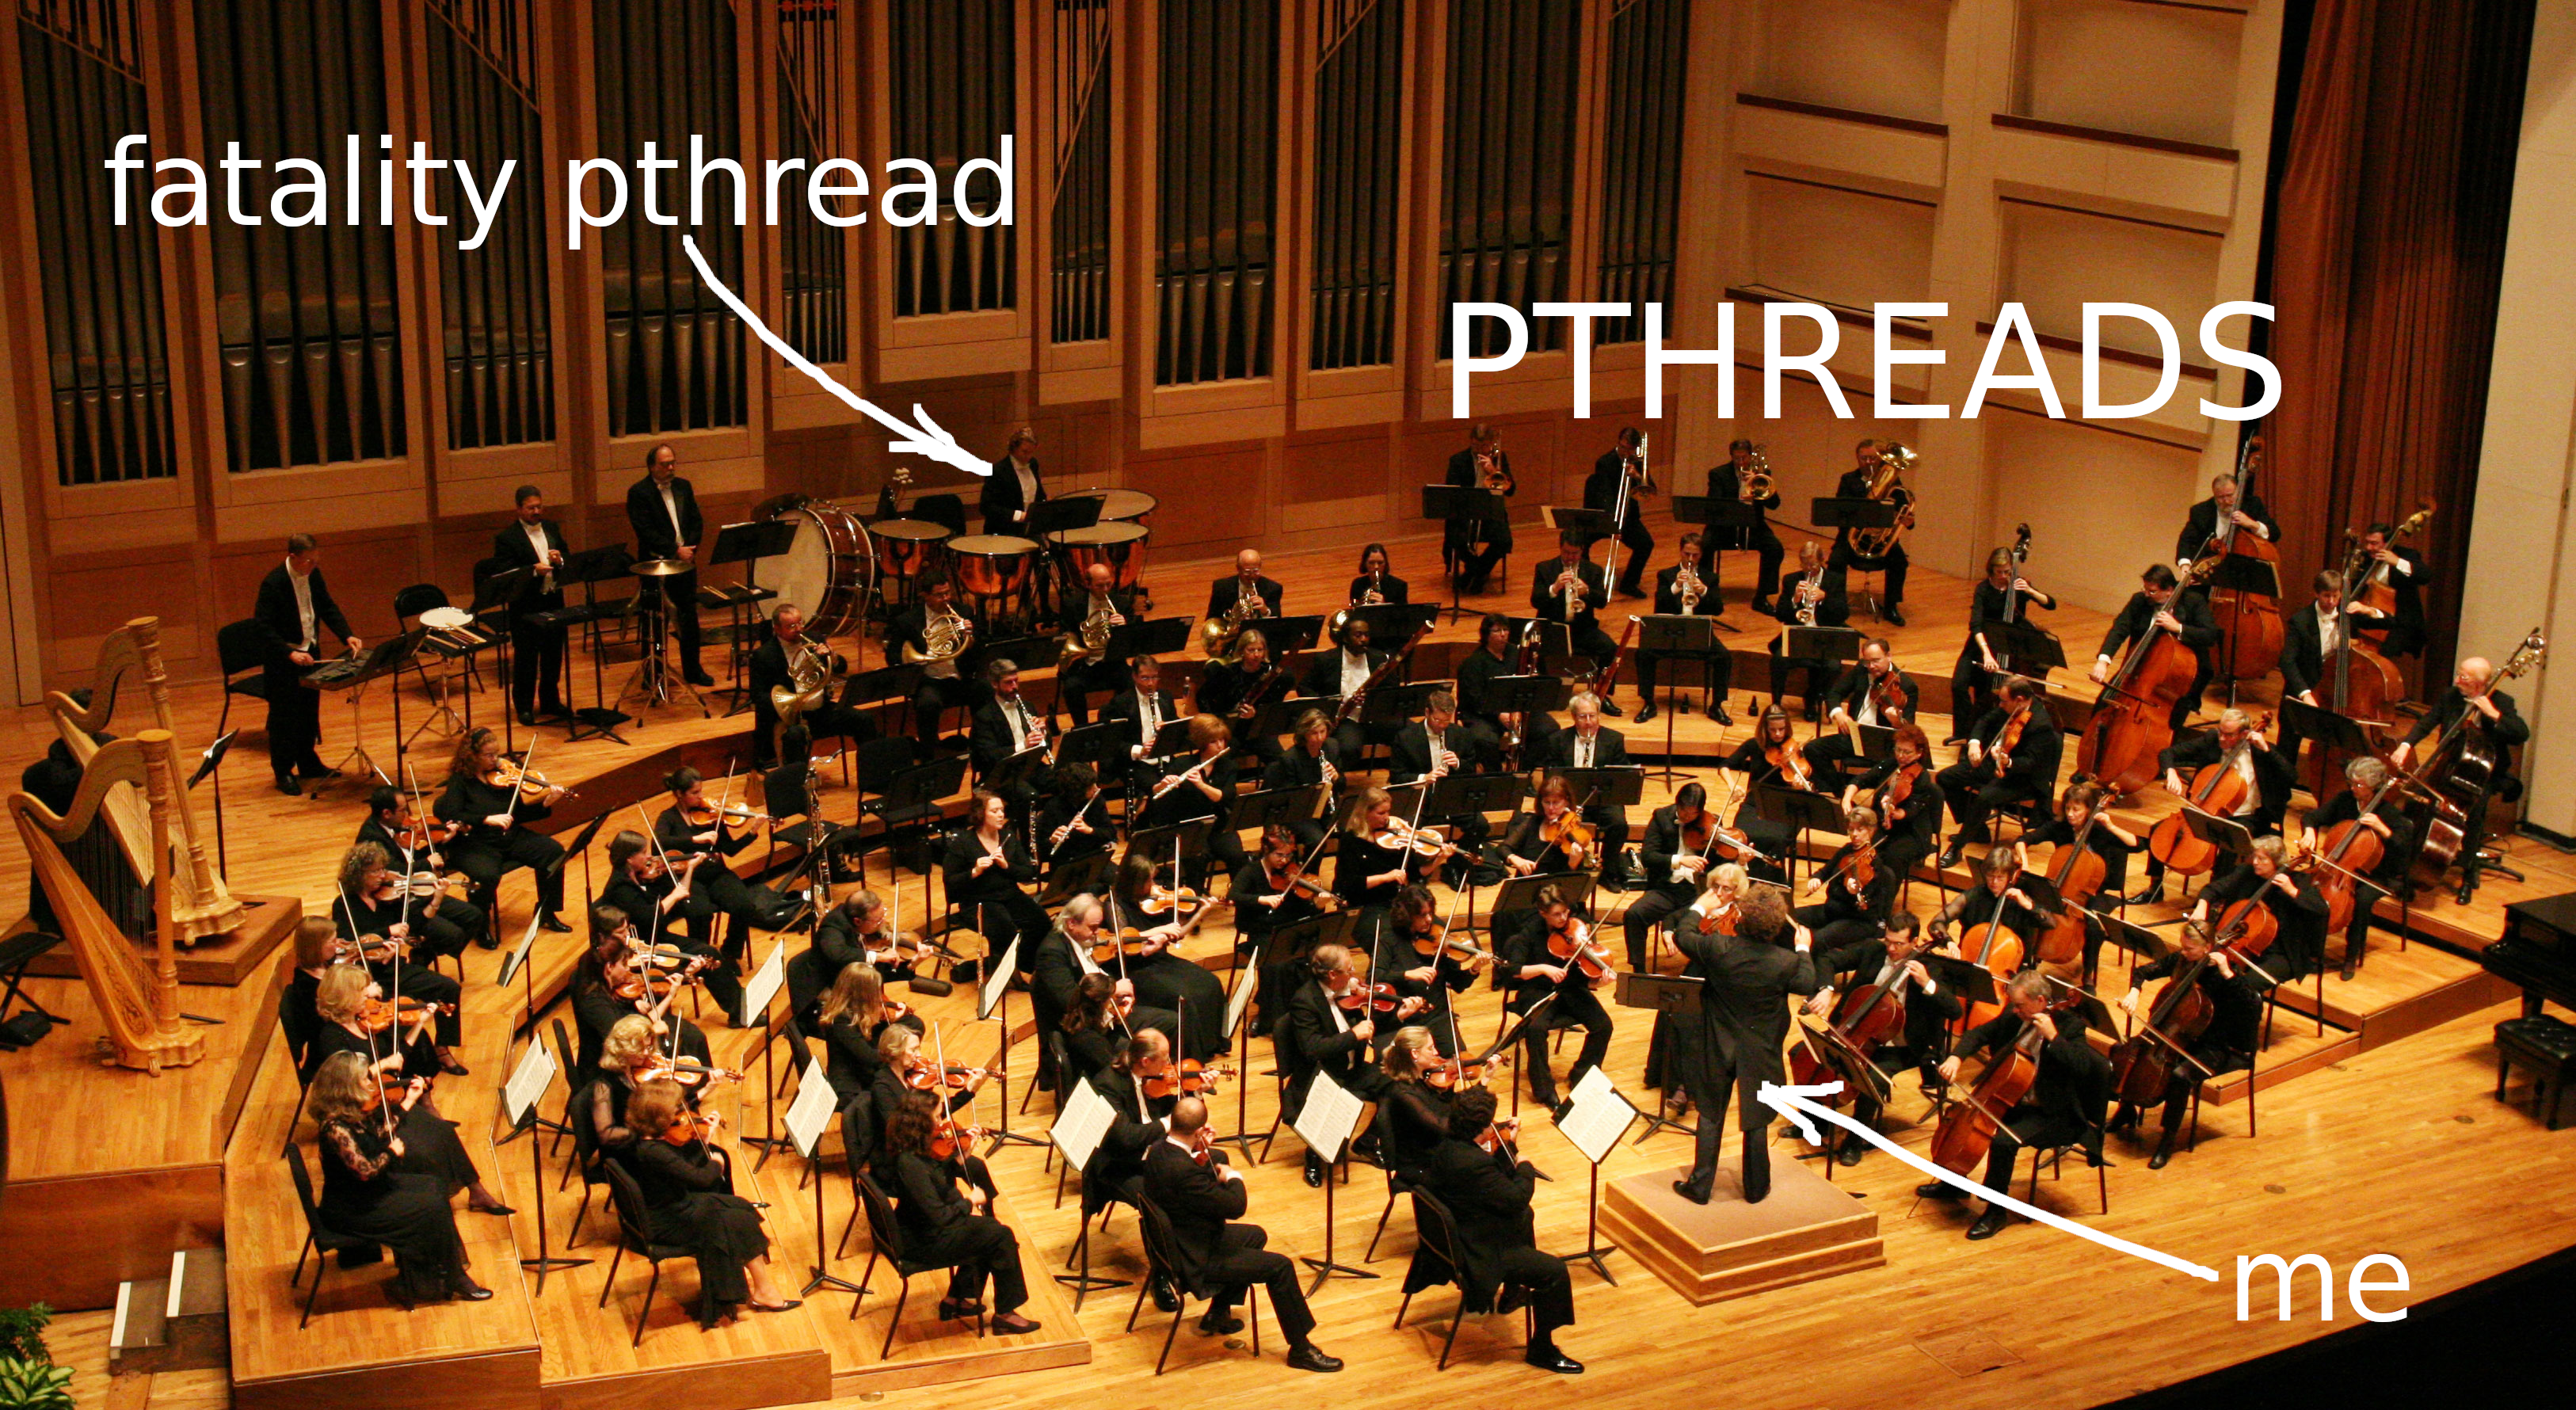 Image source: https://singletothemax.files.wordpress.com/2011/02/symphony_099_cropped1.jpg